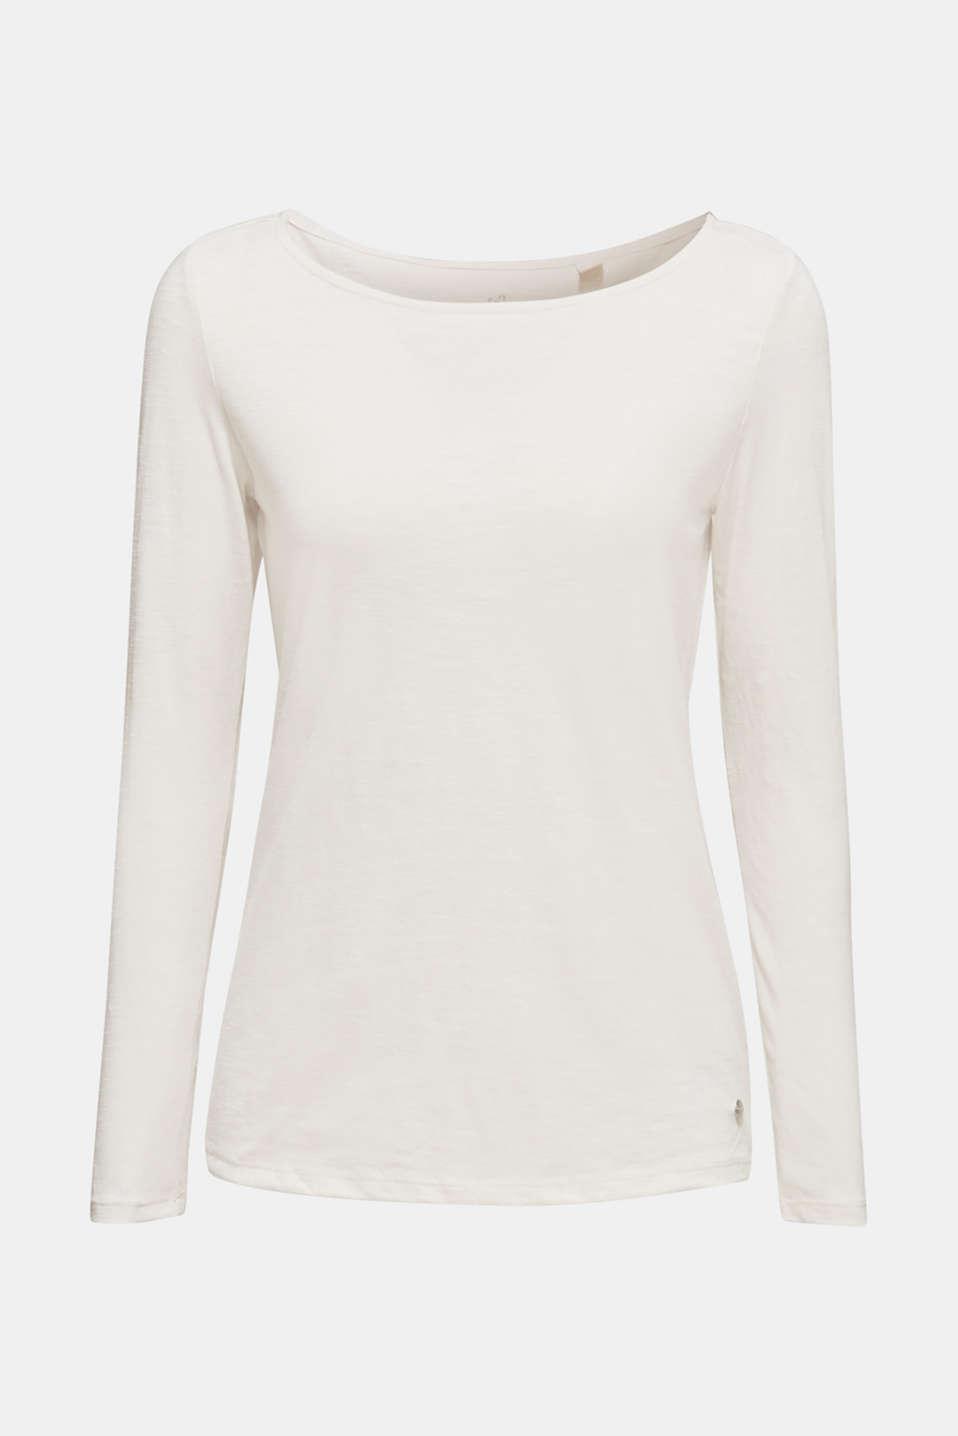 Long sleeve slub top with organic cotton, LIGHT BEIGE 5, detail image number 6